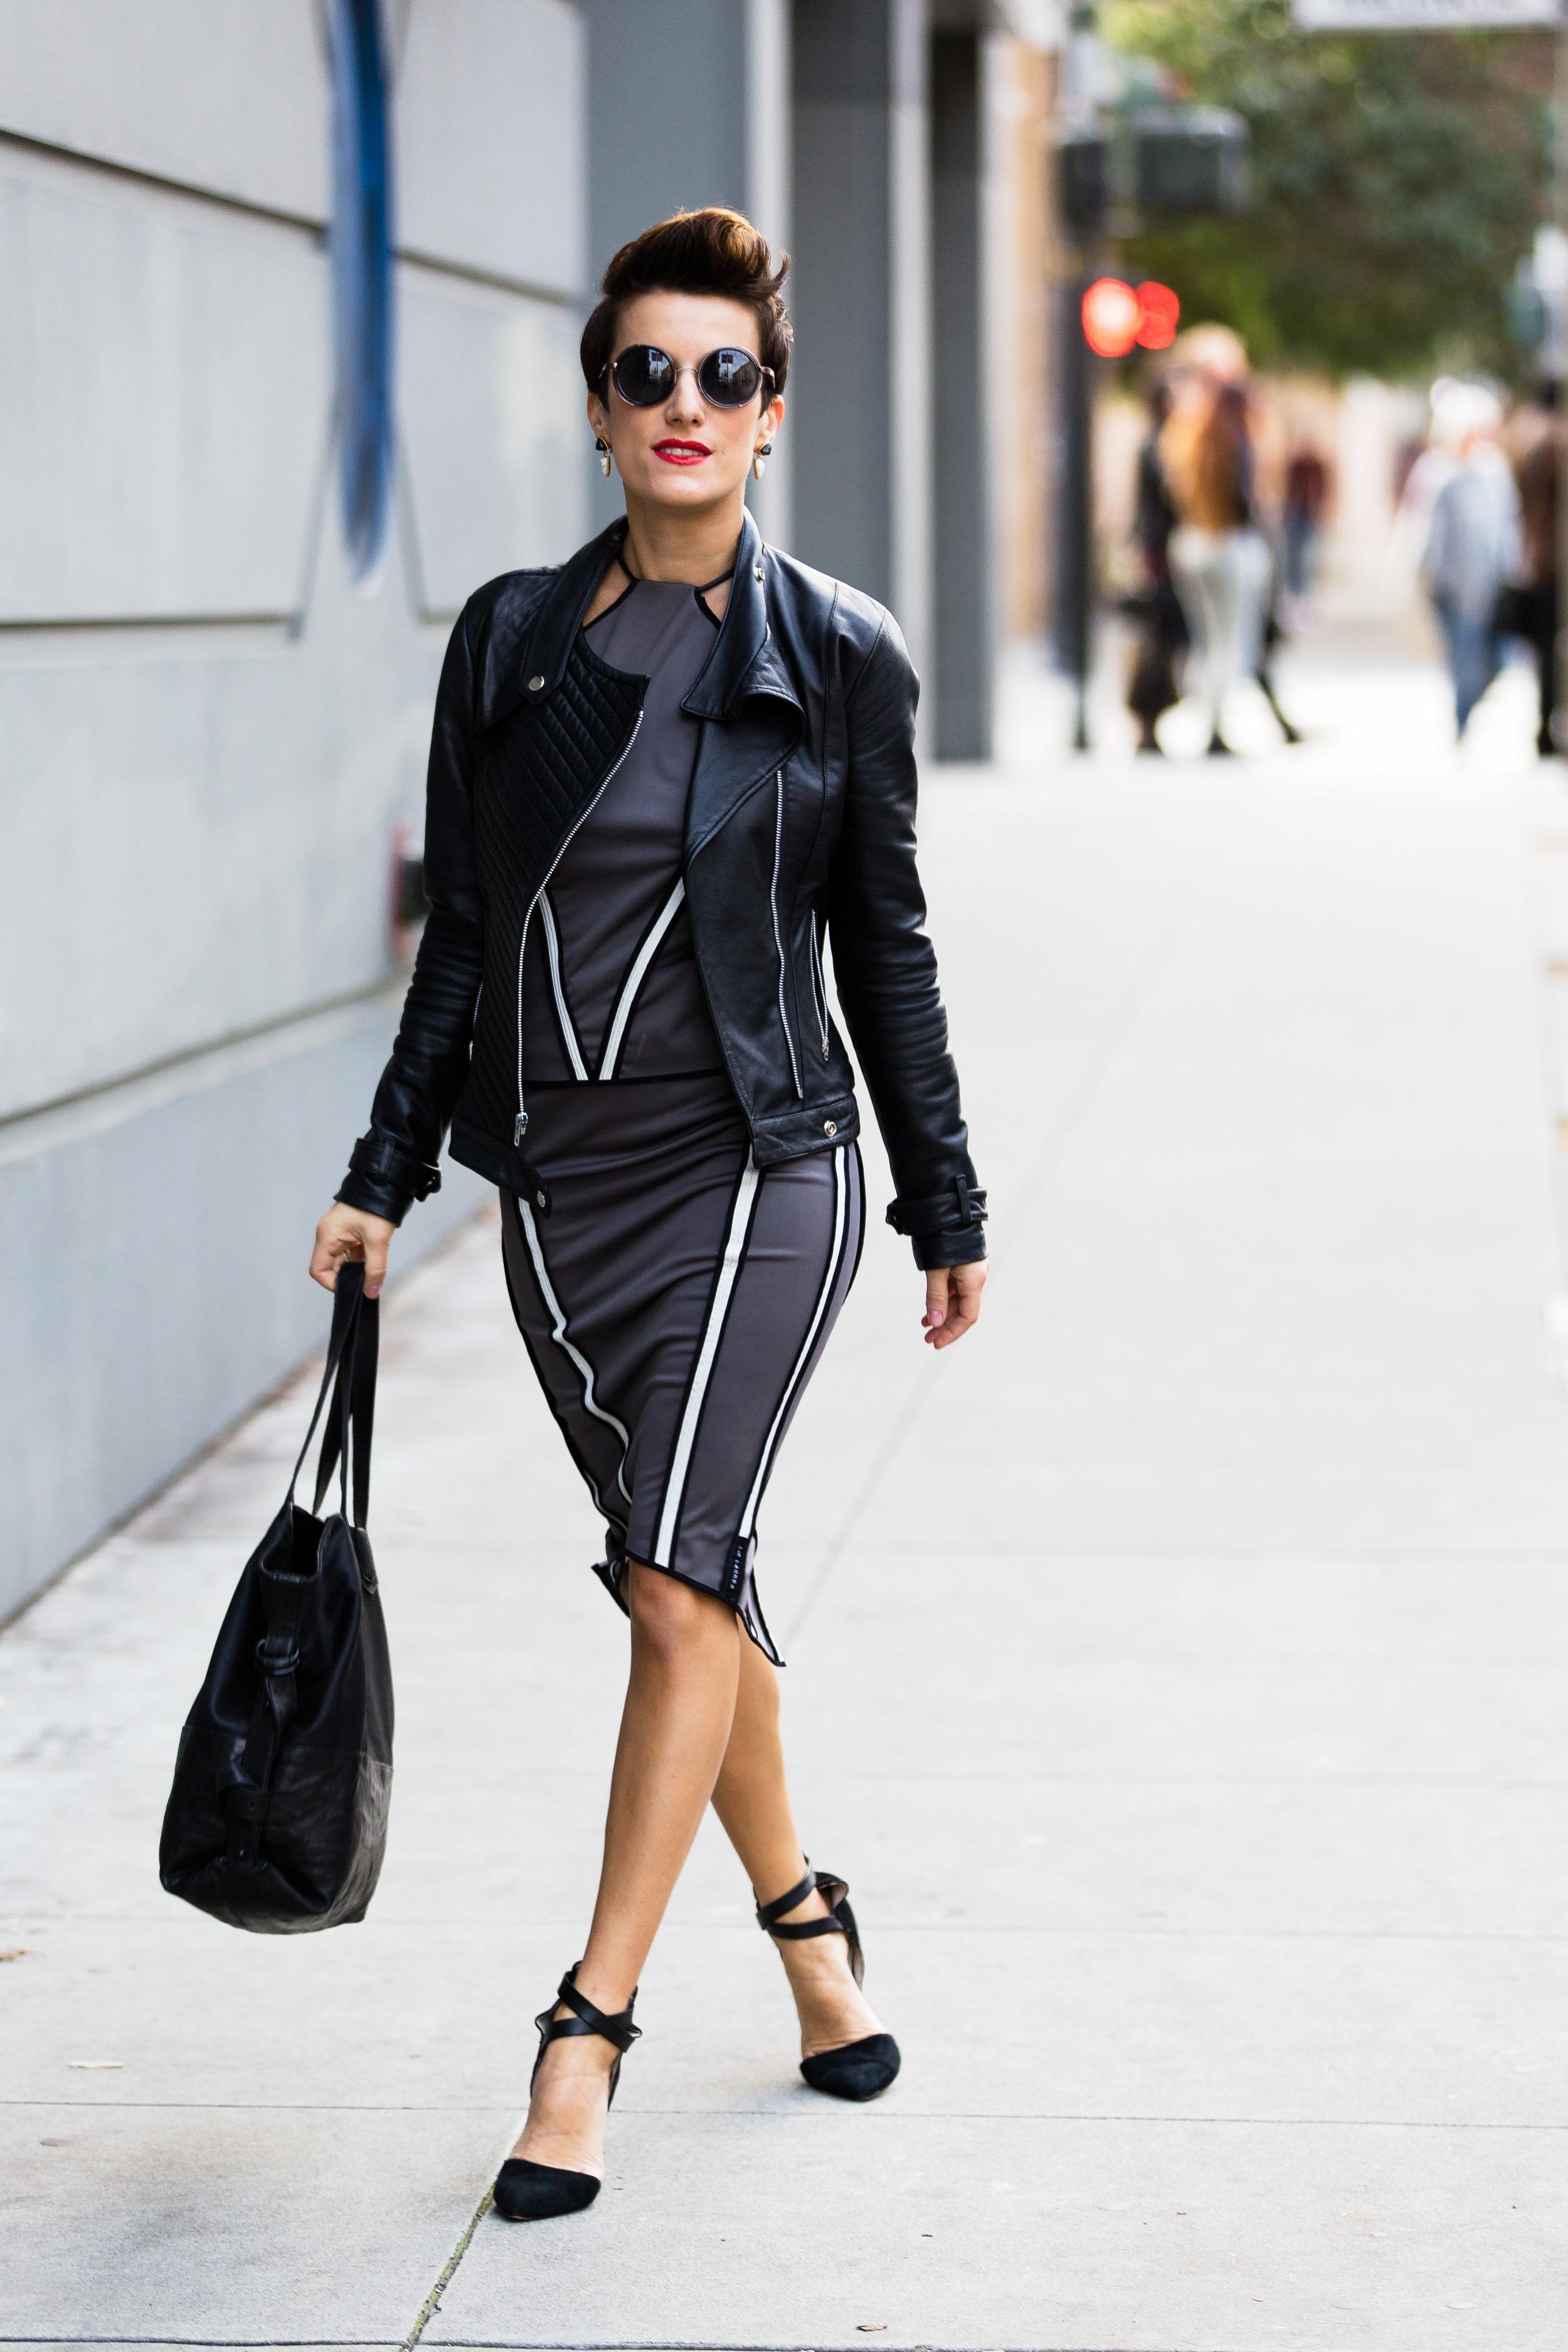 Zuria Halter Top,Brea Pencil Skirt (AW17) | Manhattan Tote Bag